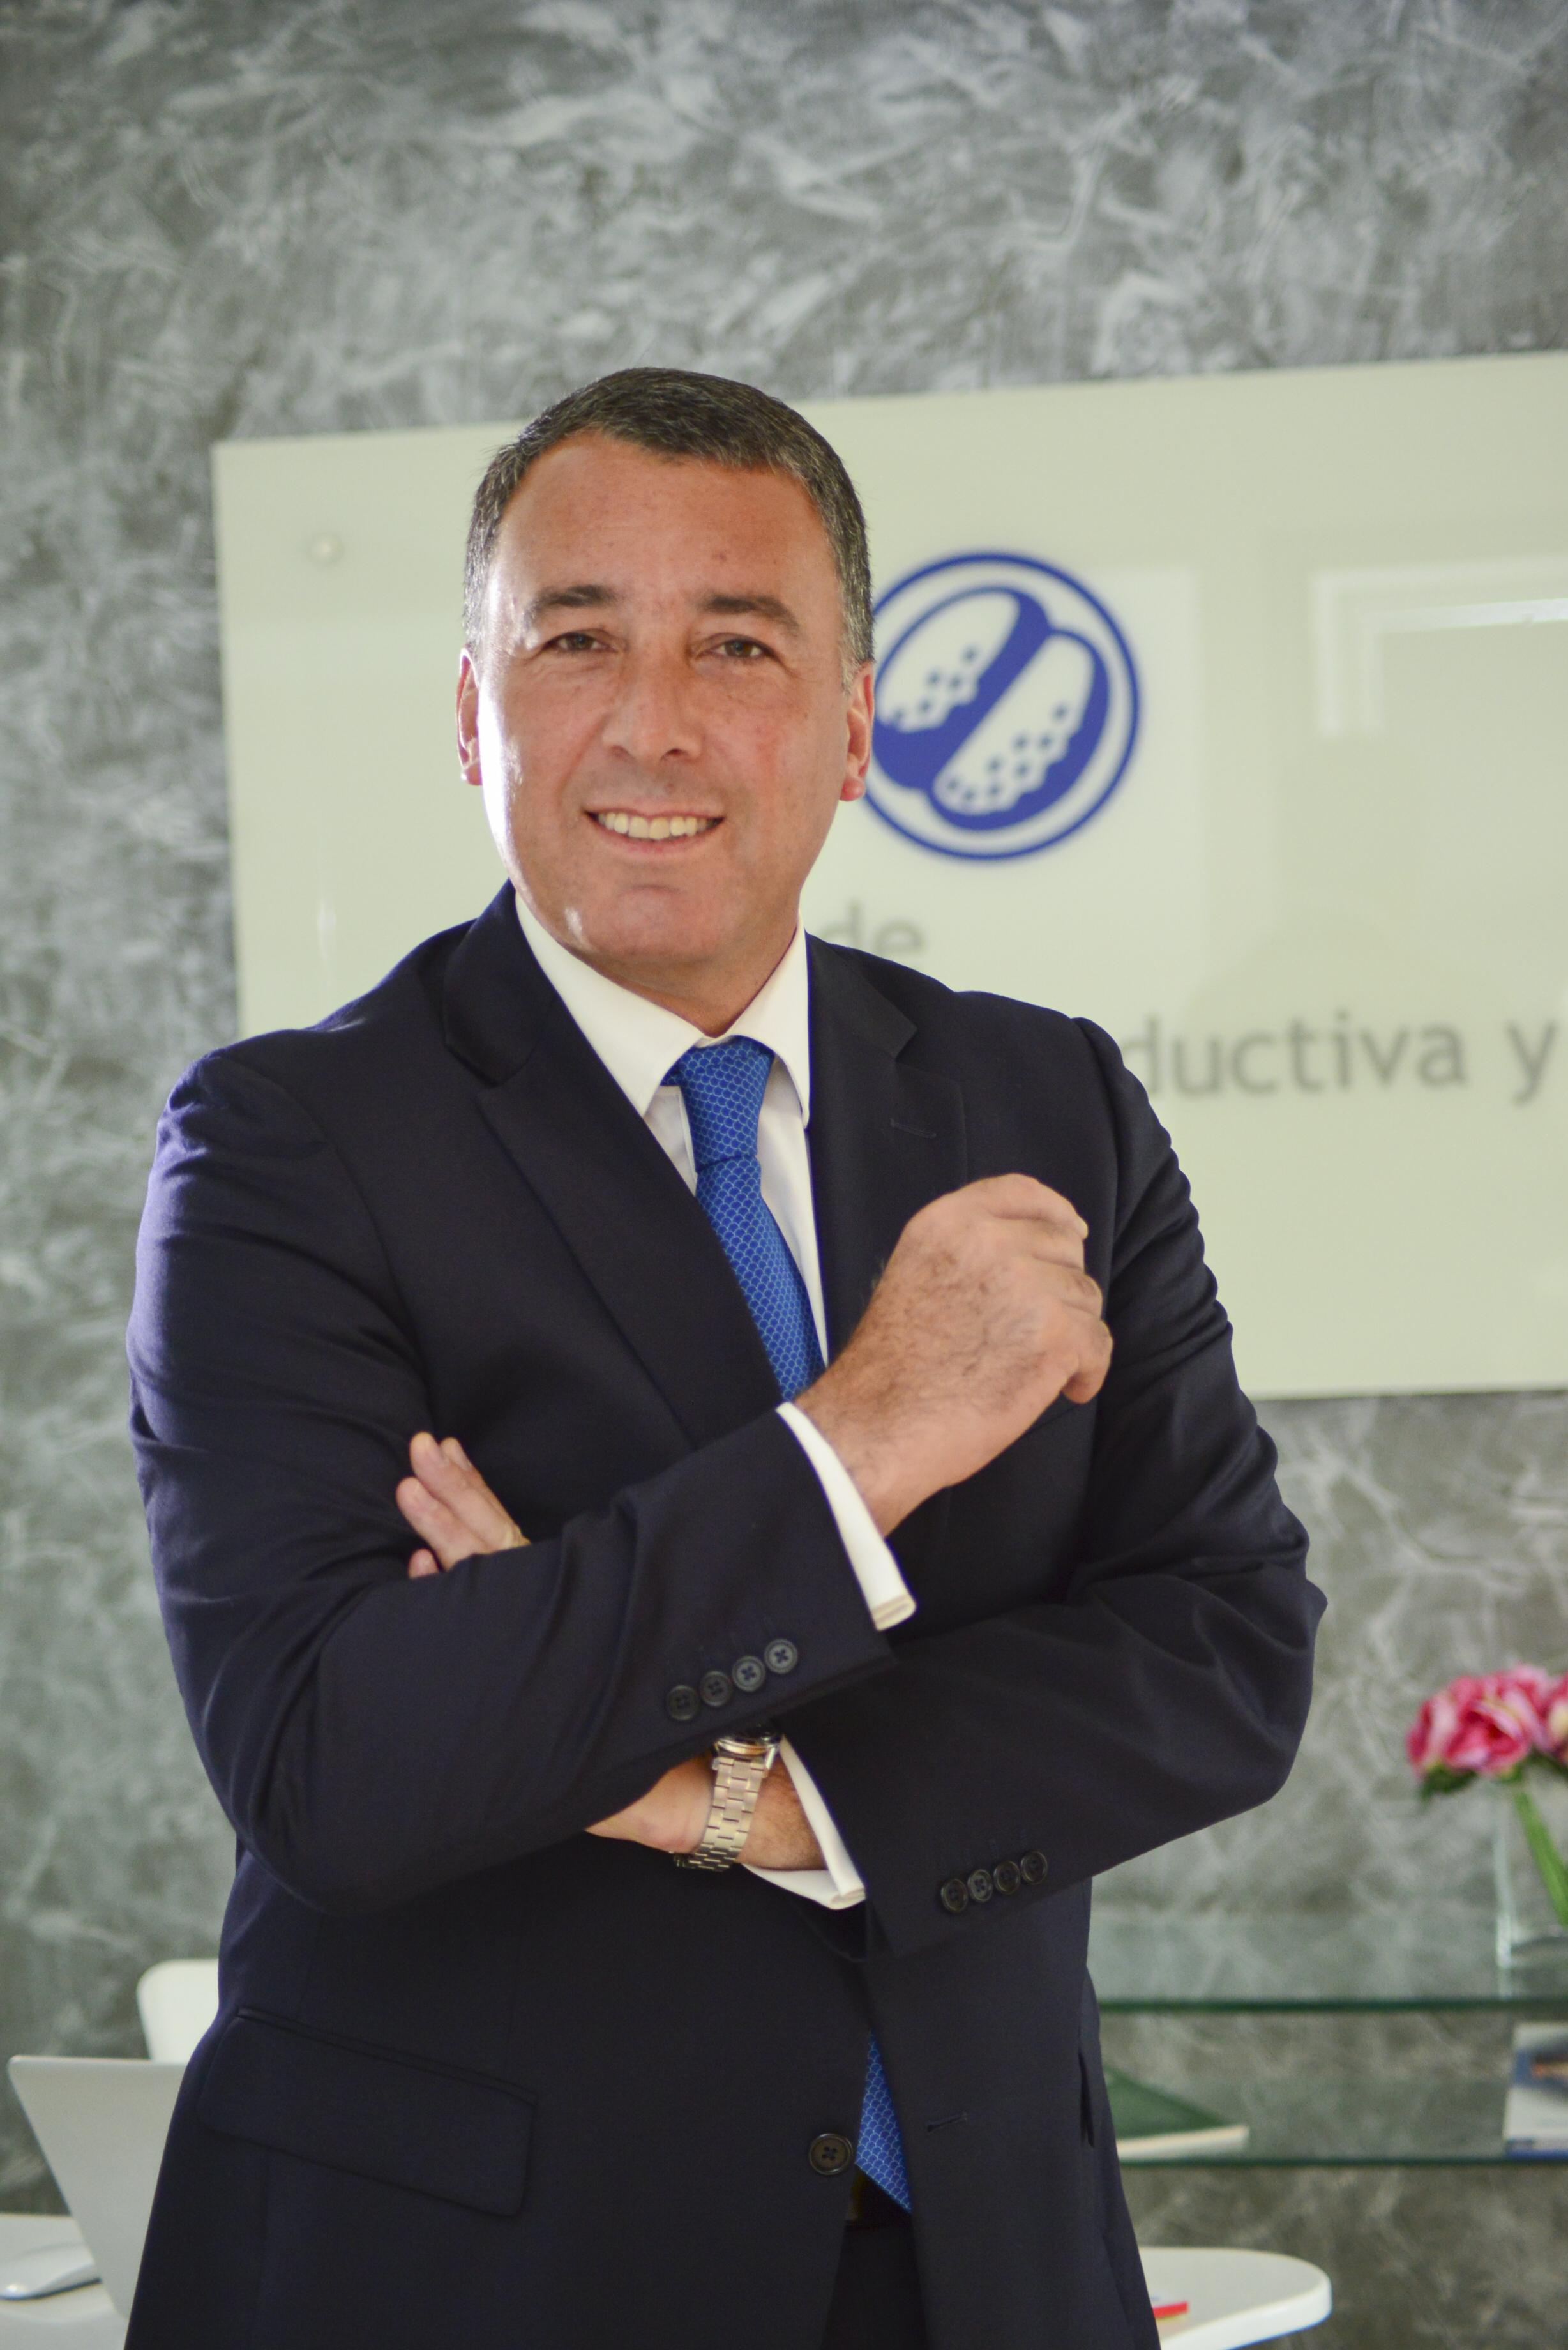 Dr. Raúl Cabra Zurita